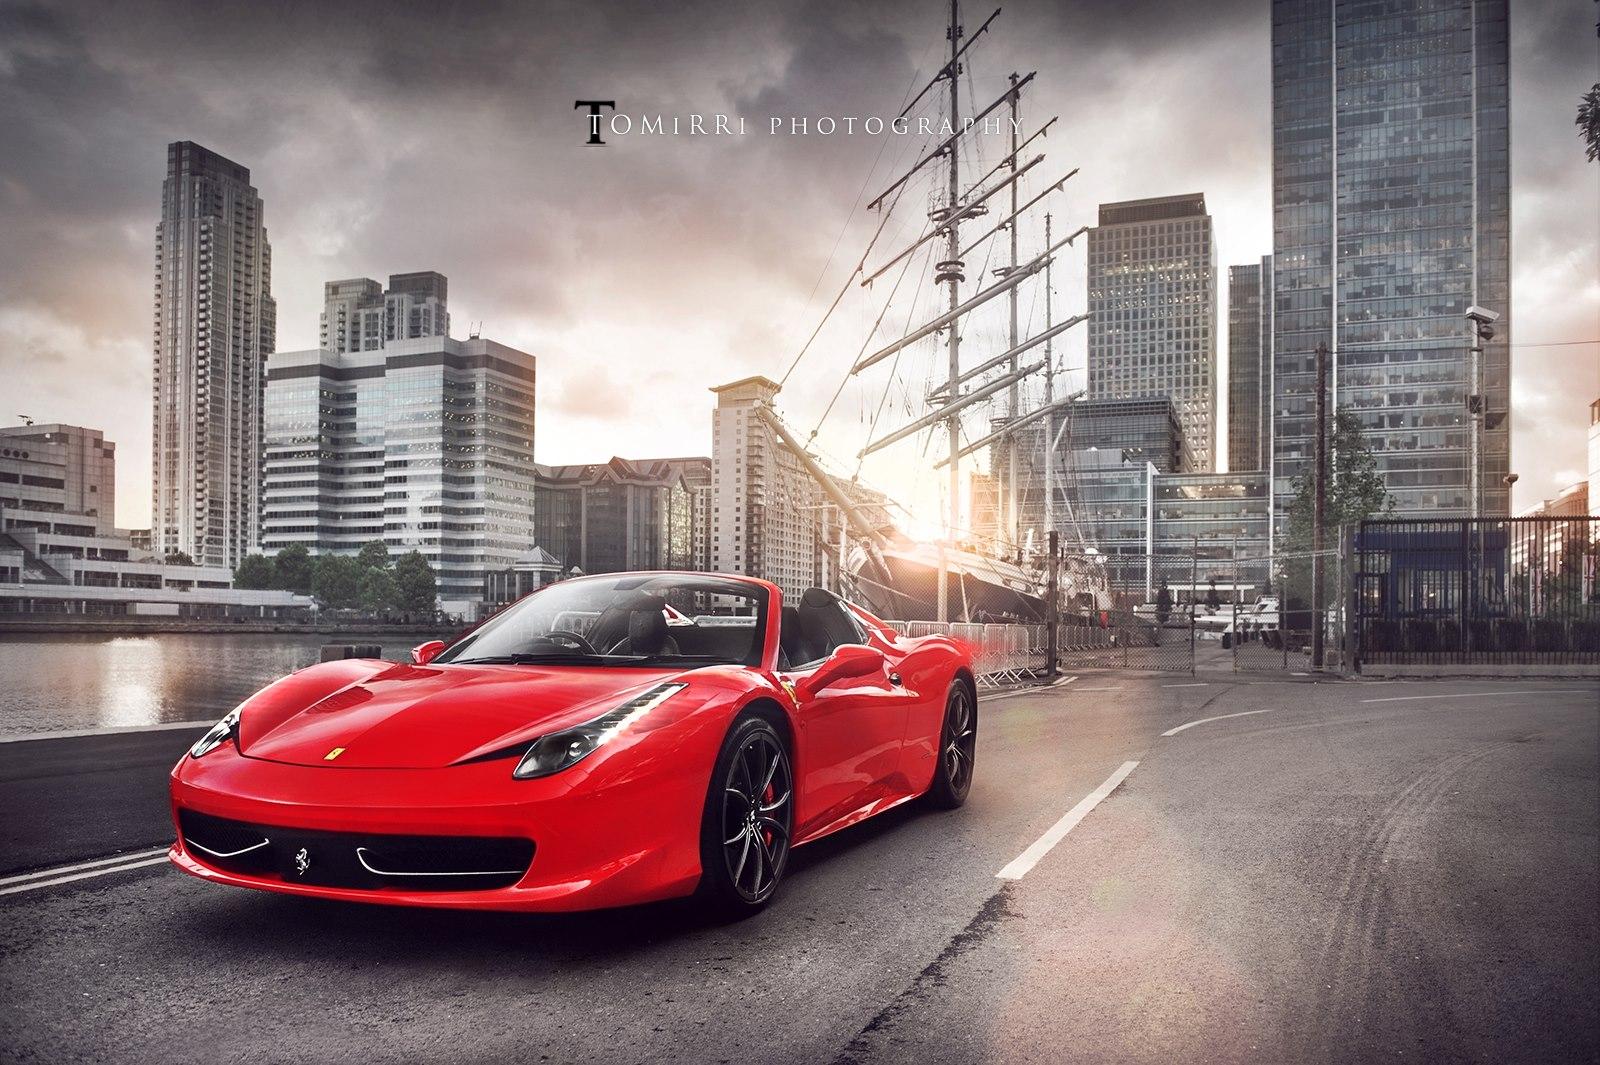 Ferrari 458 Spider Through the Eyes of a Photographer